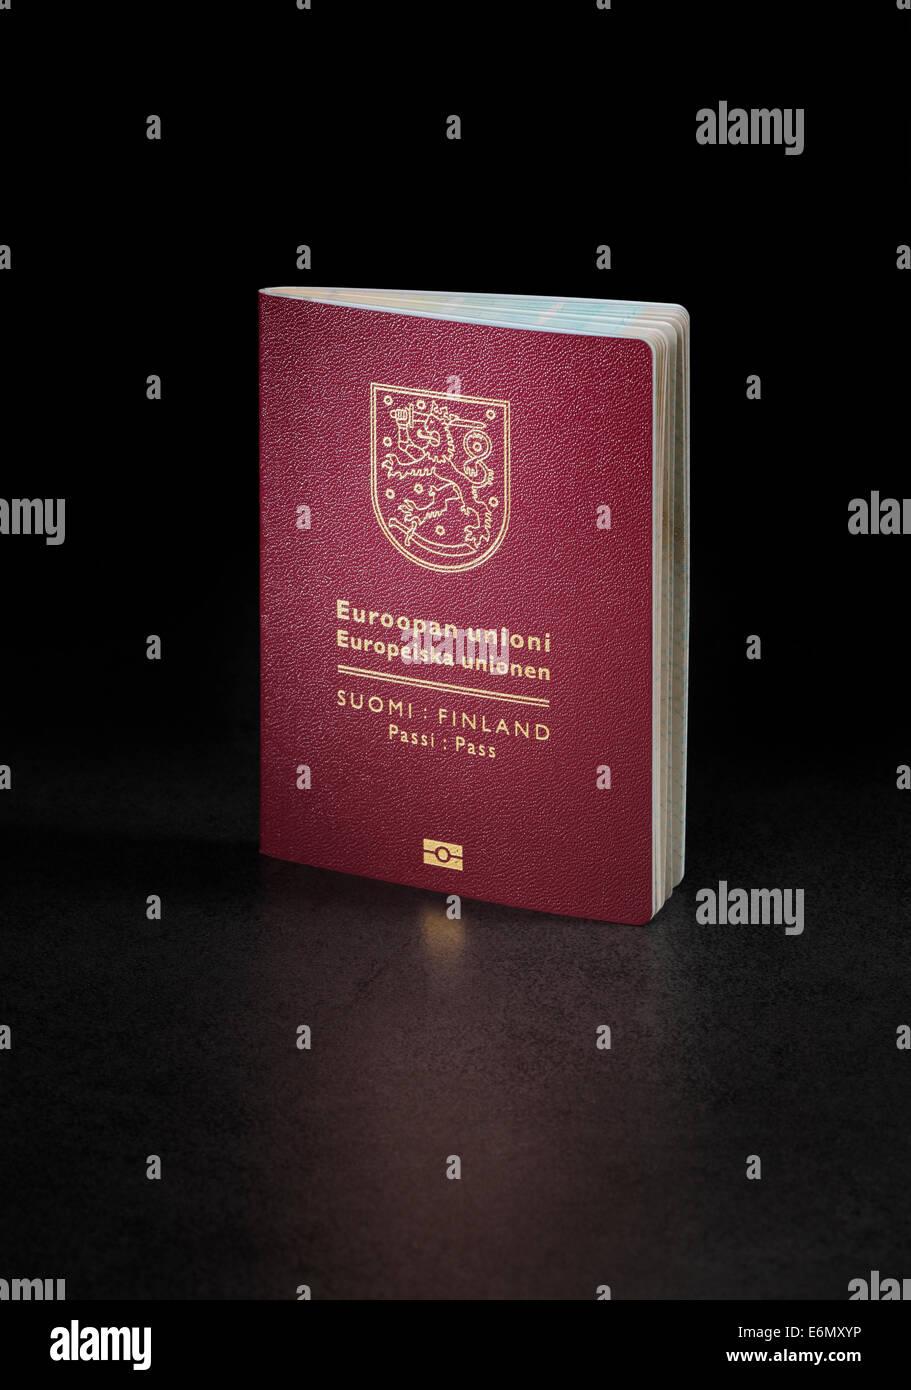 Finnish (Finland) passport. This is the new (2013) of the passport. - Stock Image